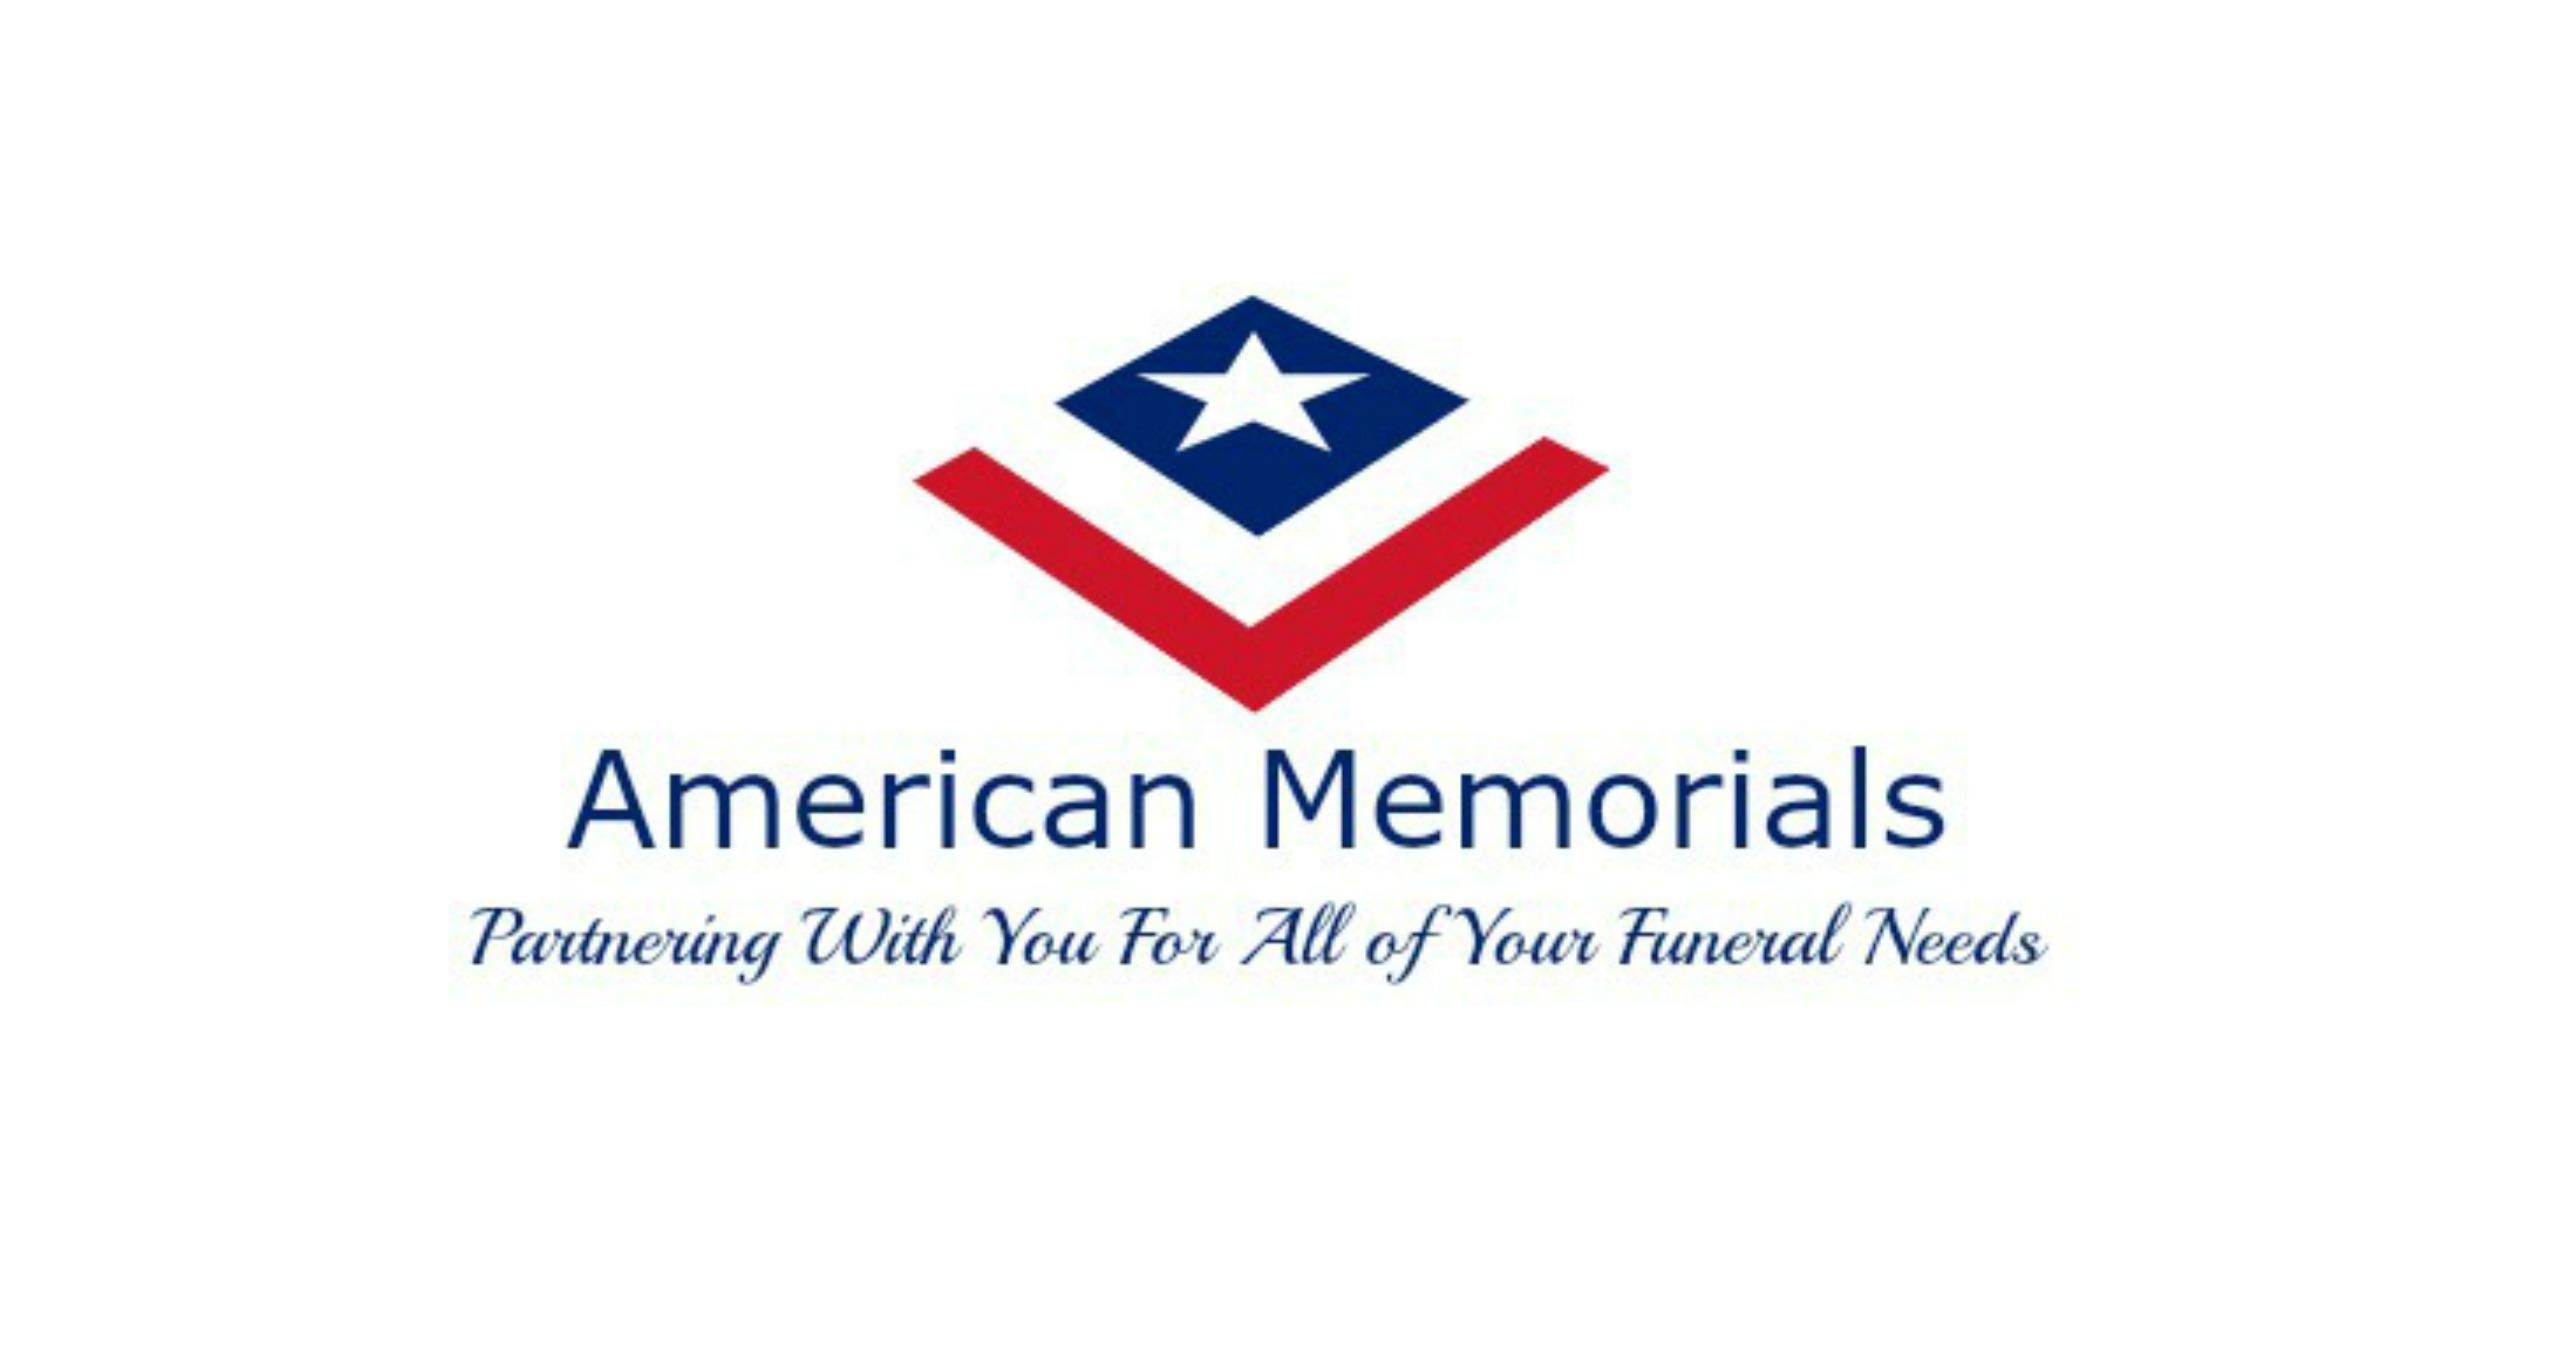 American Memorials